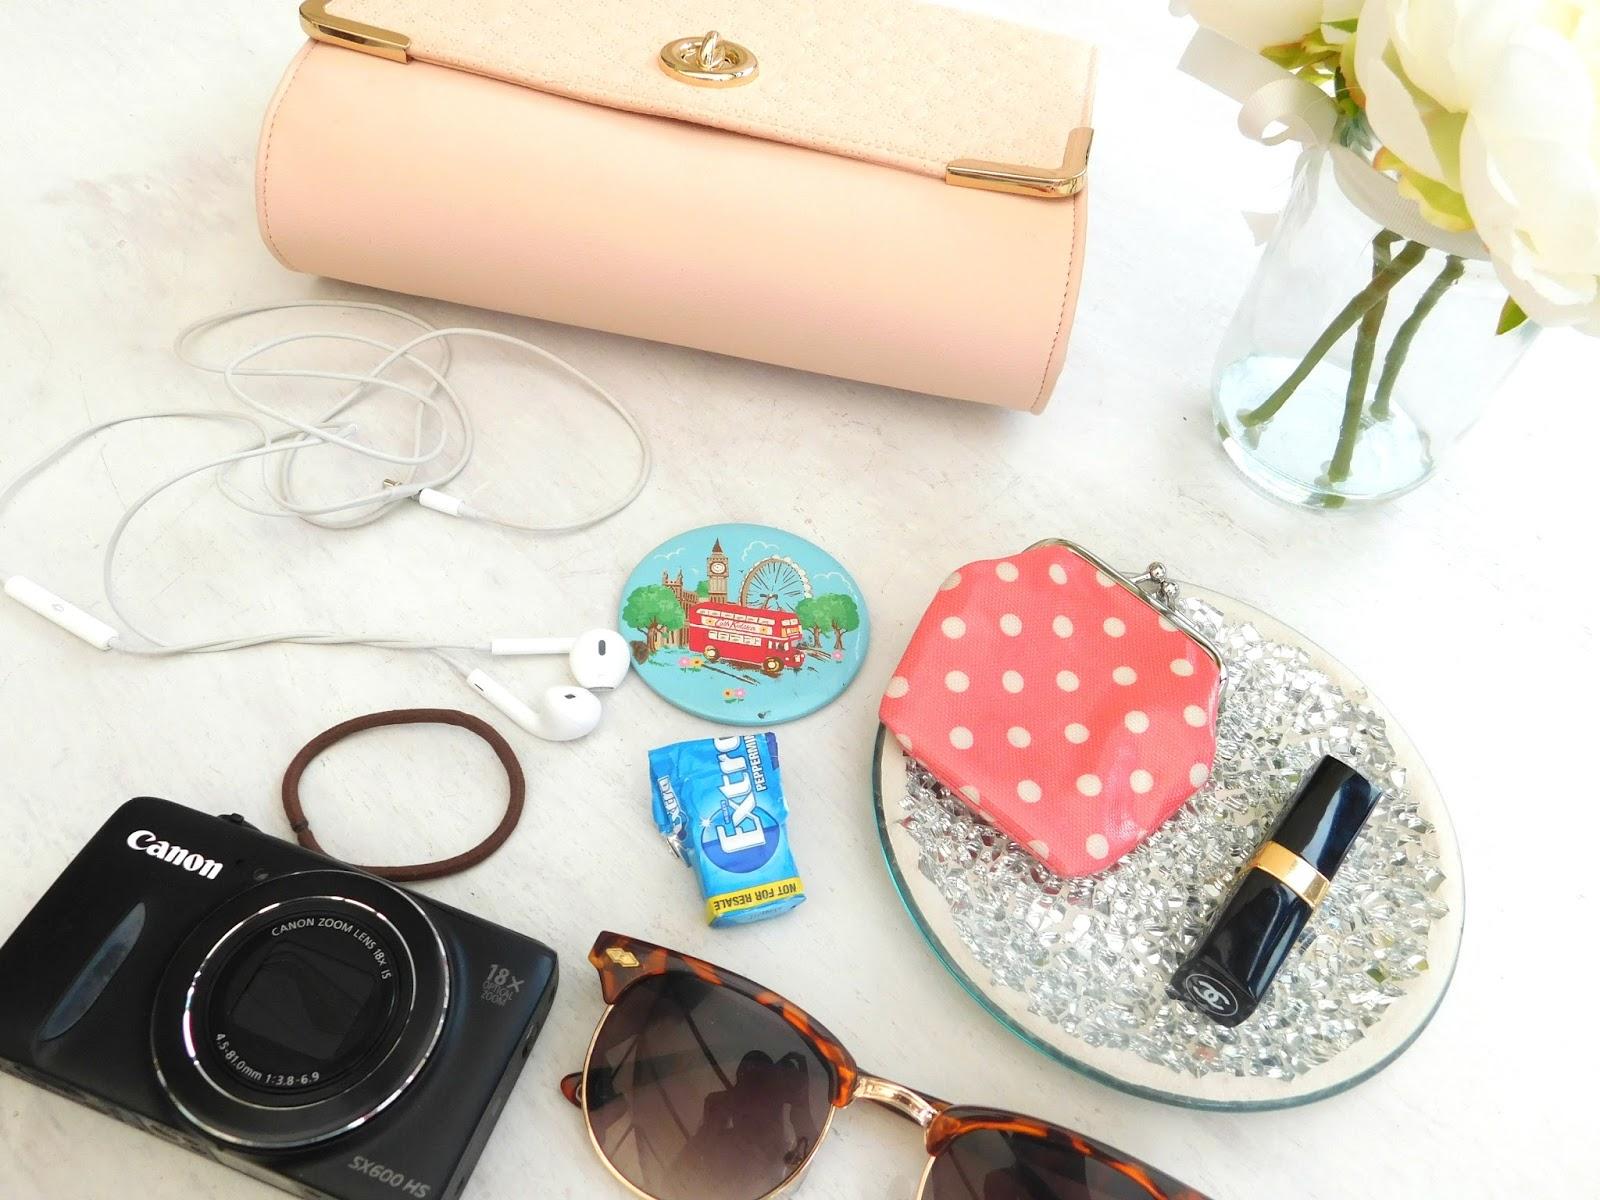 What's In My Bag, Handbags, New Look